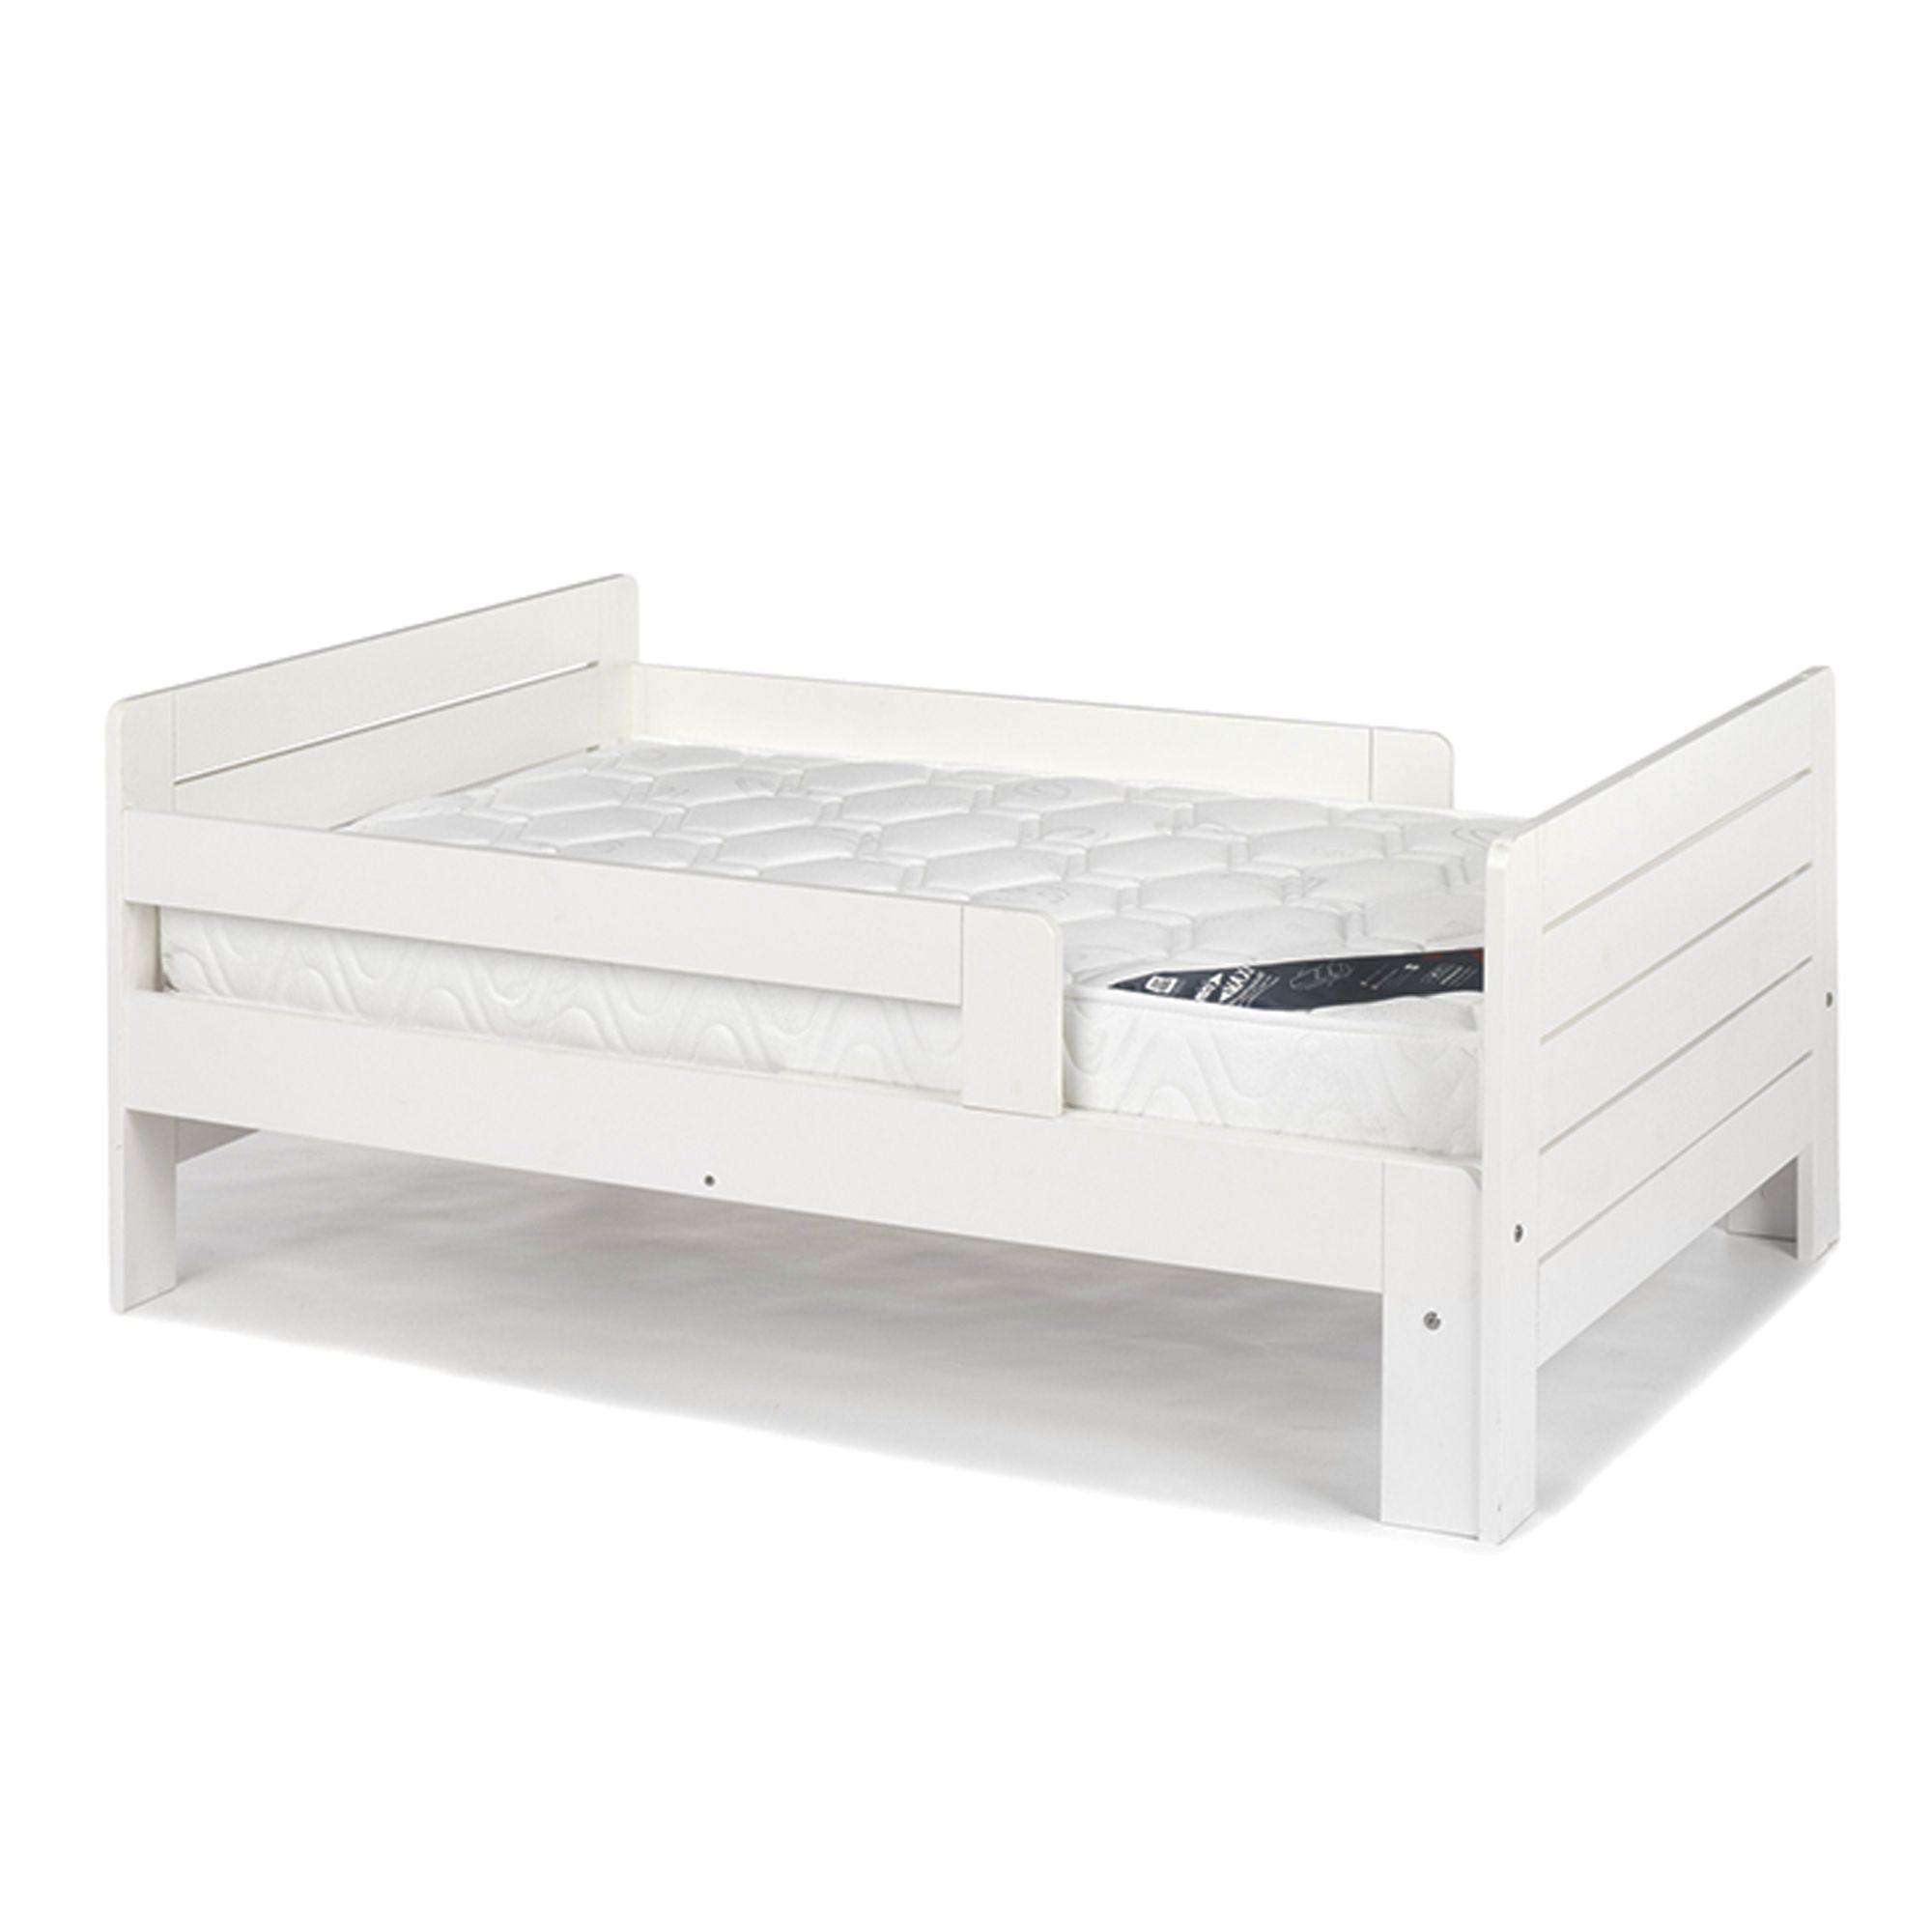 matelas bultex lit evolutif ouistitipop. Black Bedroom Furniture Sets. Home Design Ideas